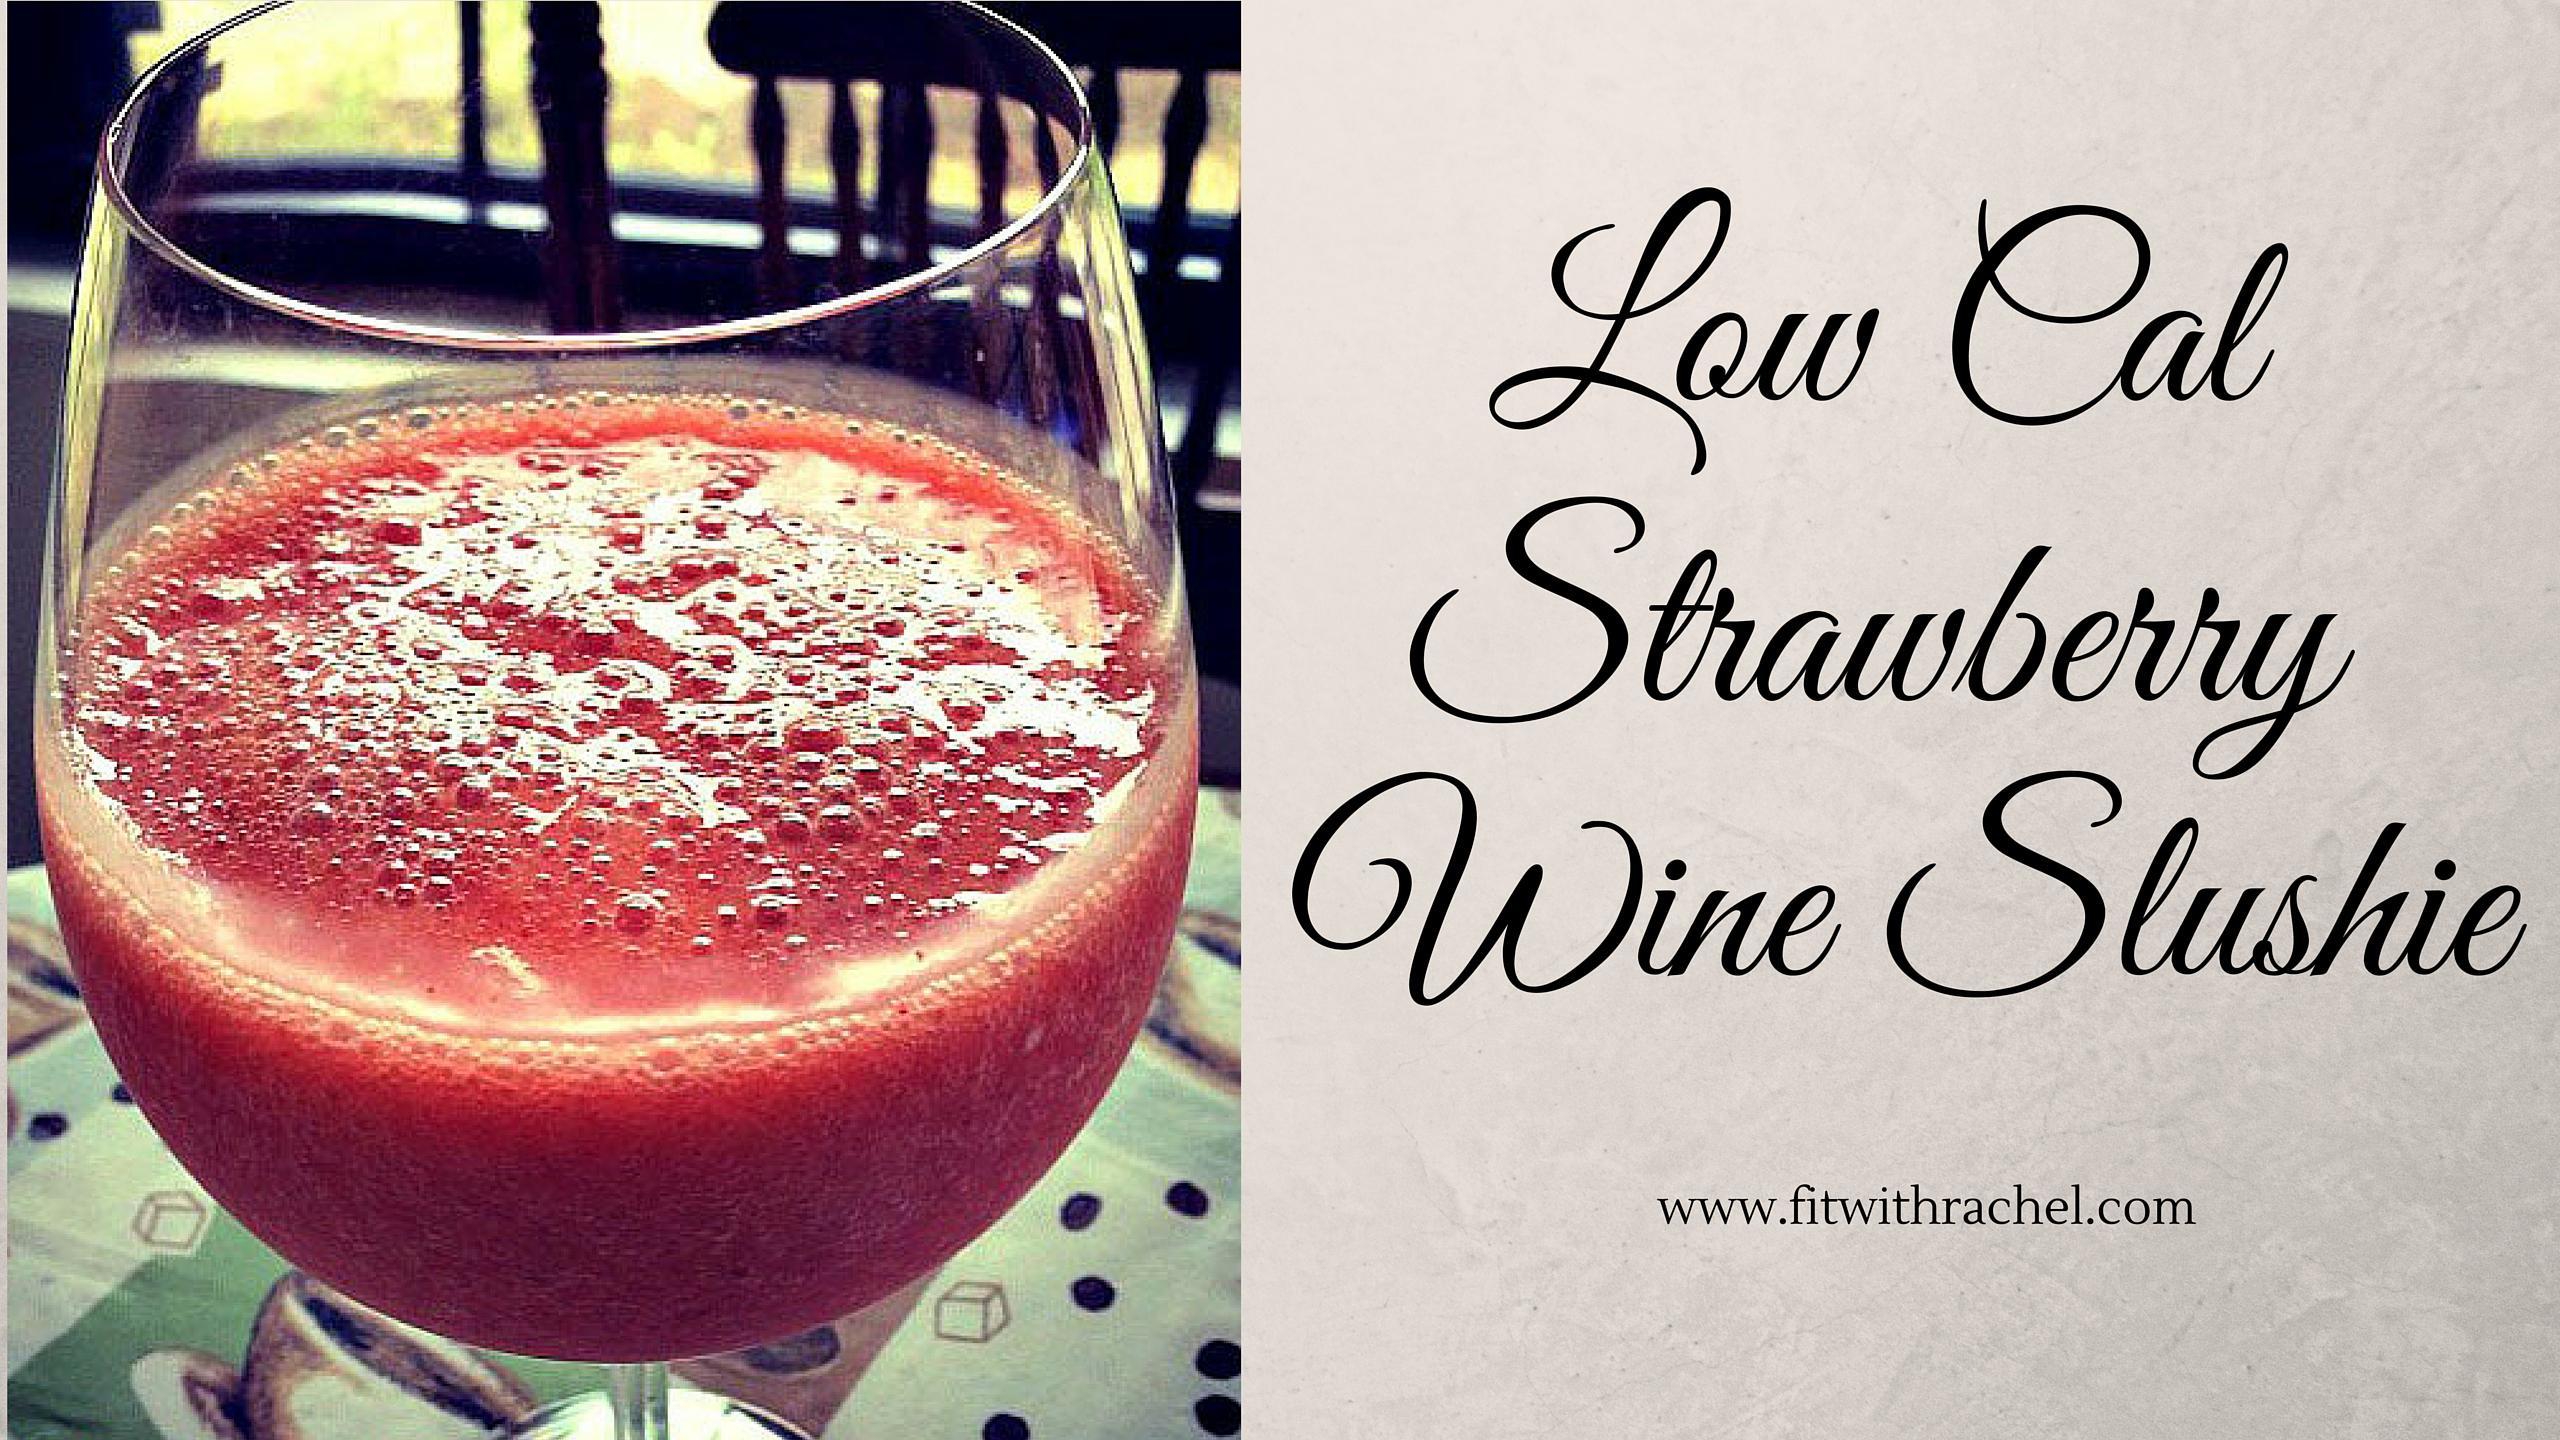 Low Calorie Strawberry Wine Slushie